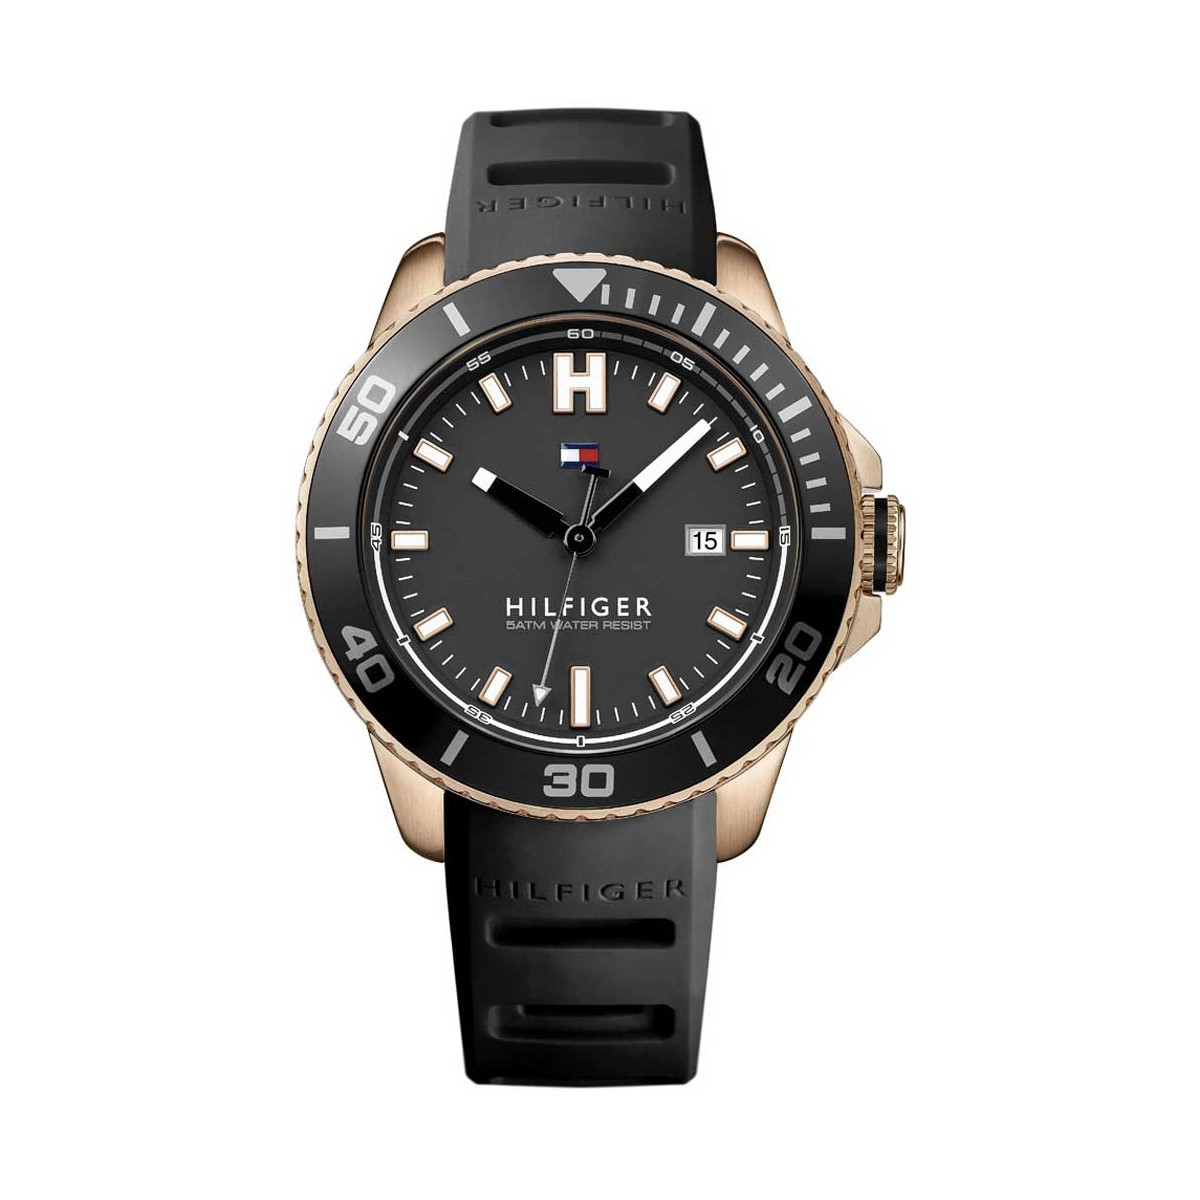 https://www.gaberjoyeria.com/3229-thickbox_default/reloj-tommy-hilfiger-1791266.jpg